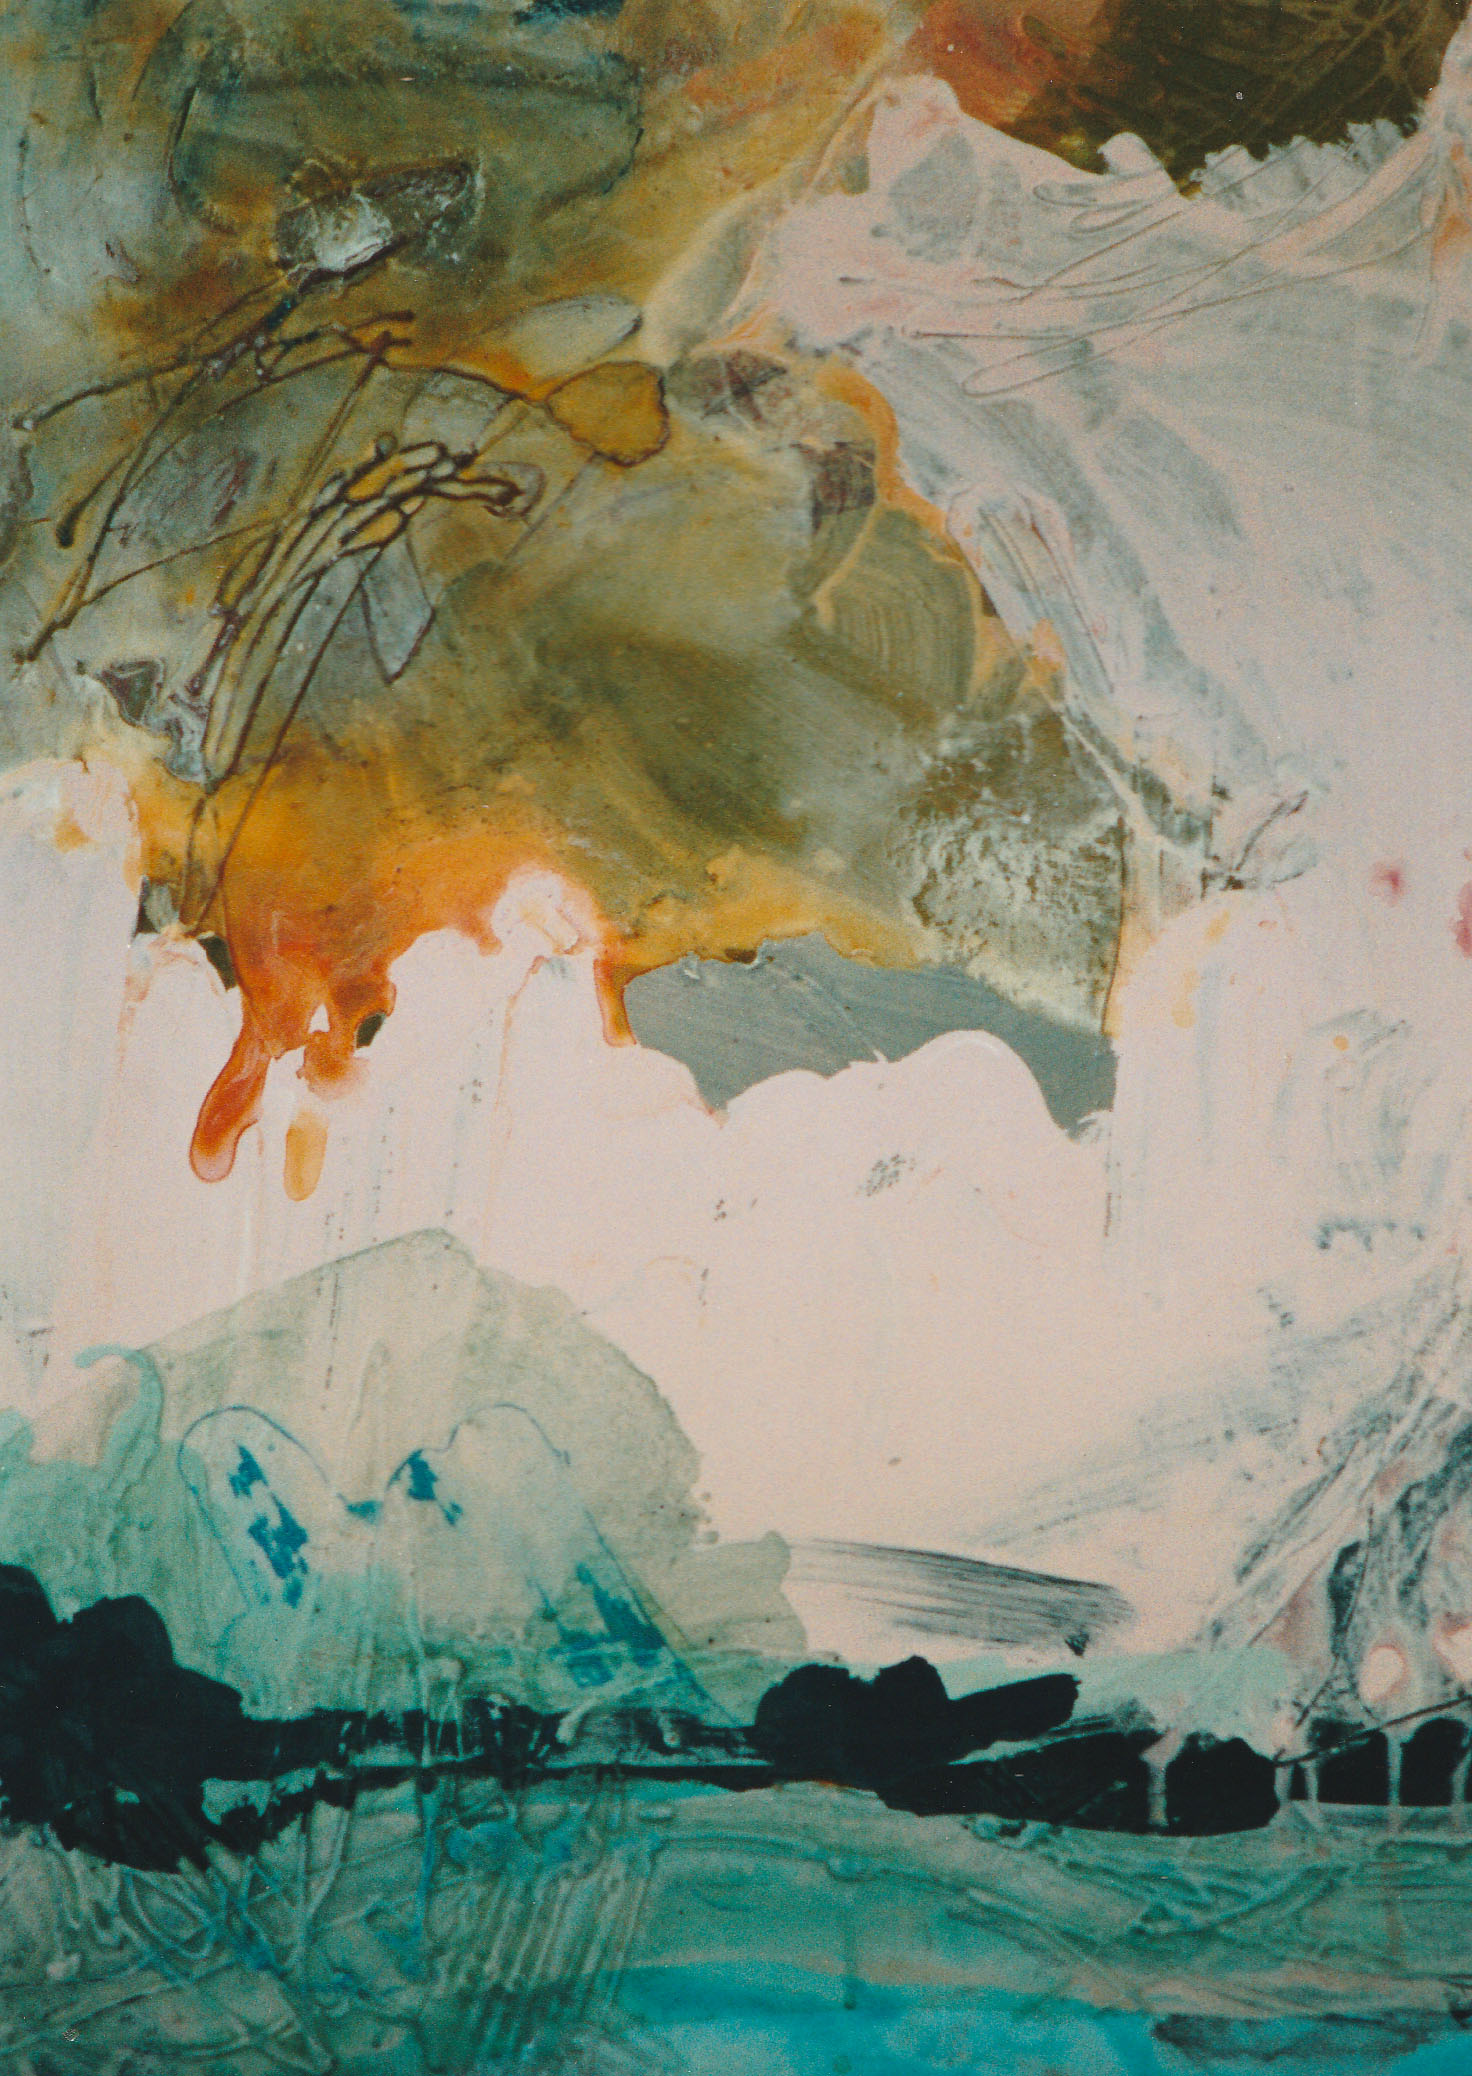 seascape 7, acrylic on canvas, 1998, 40 x 60cm sold